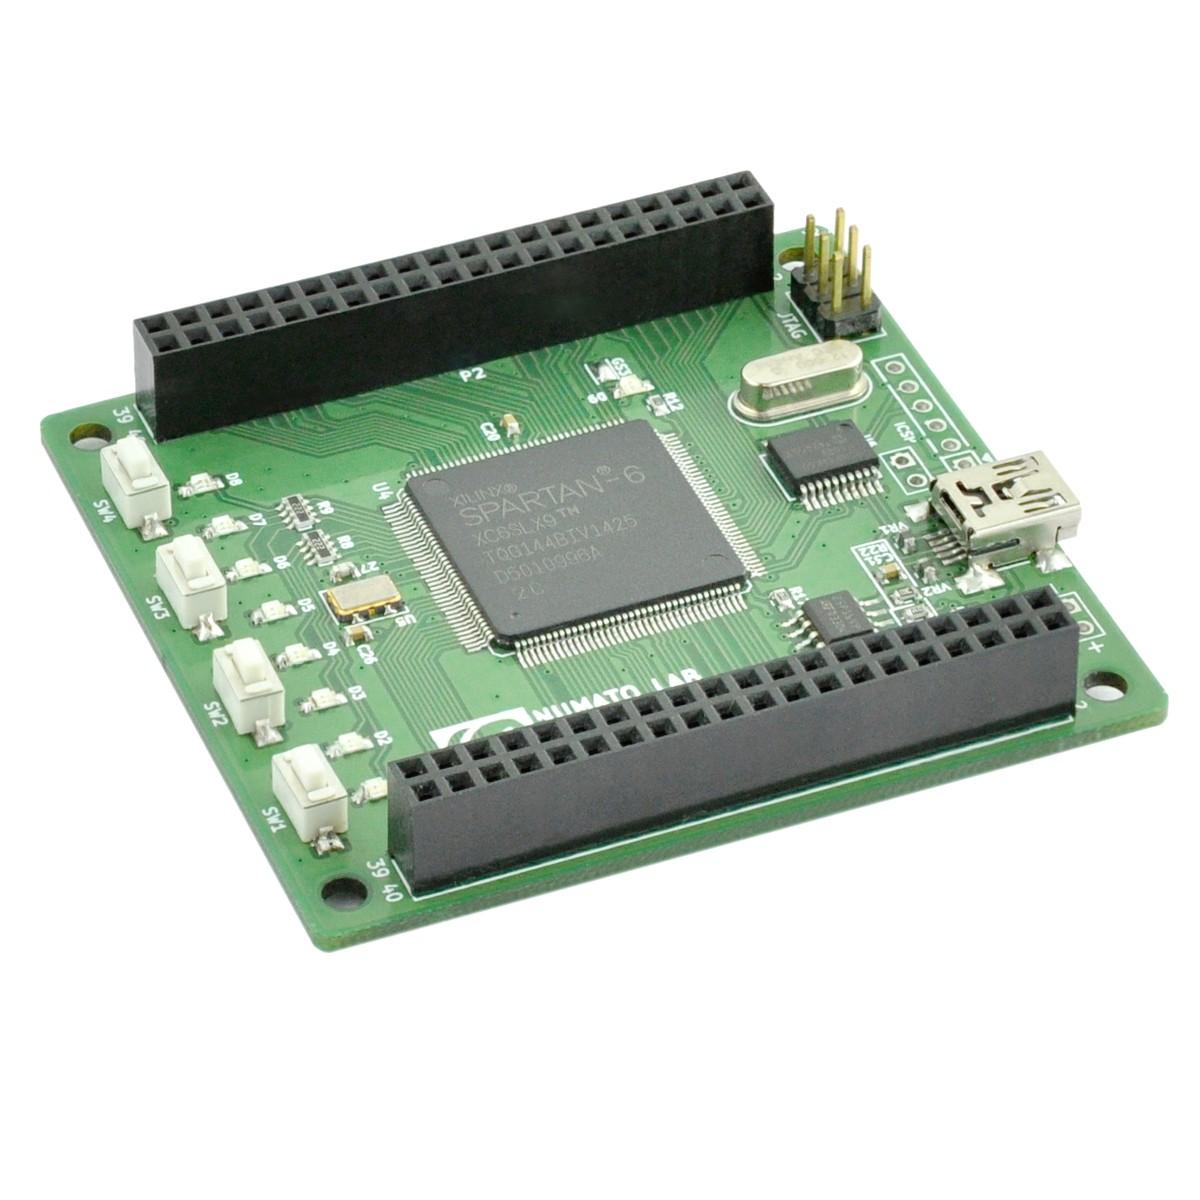 Mimas - Spartan 6 FPGA Development Board